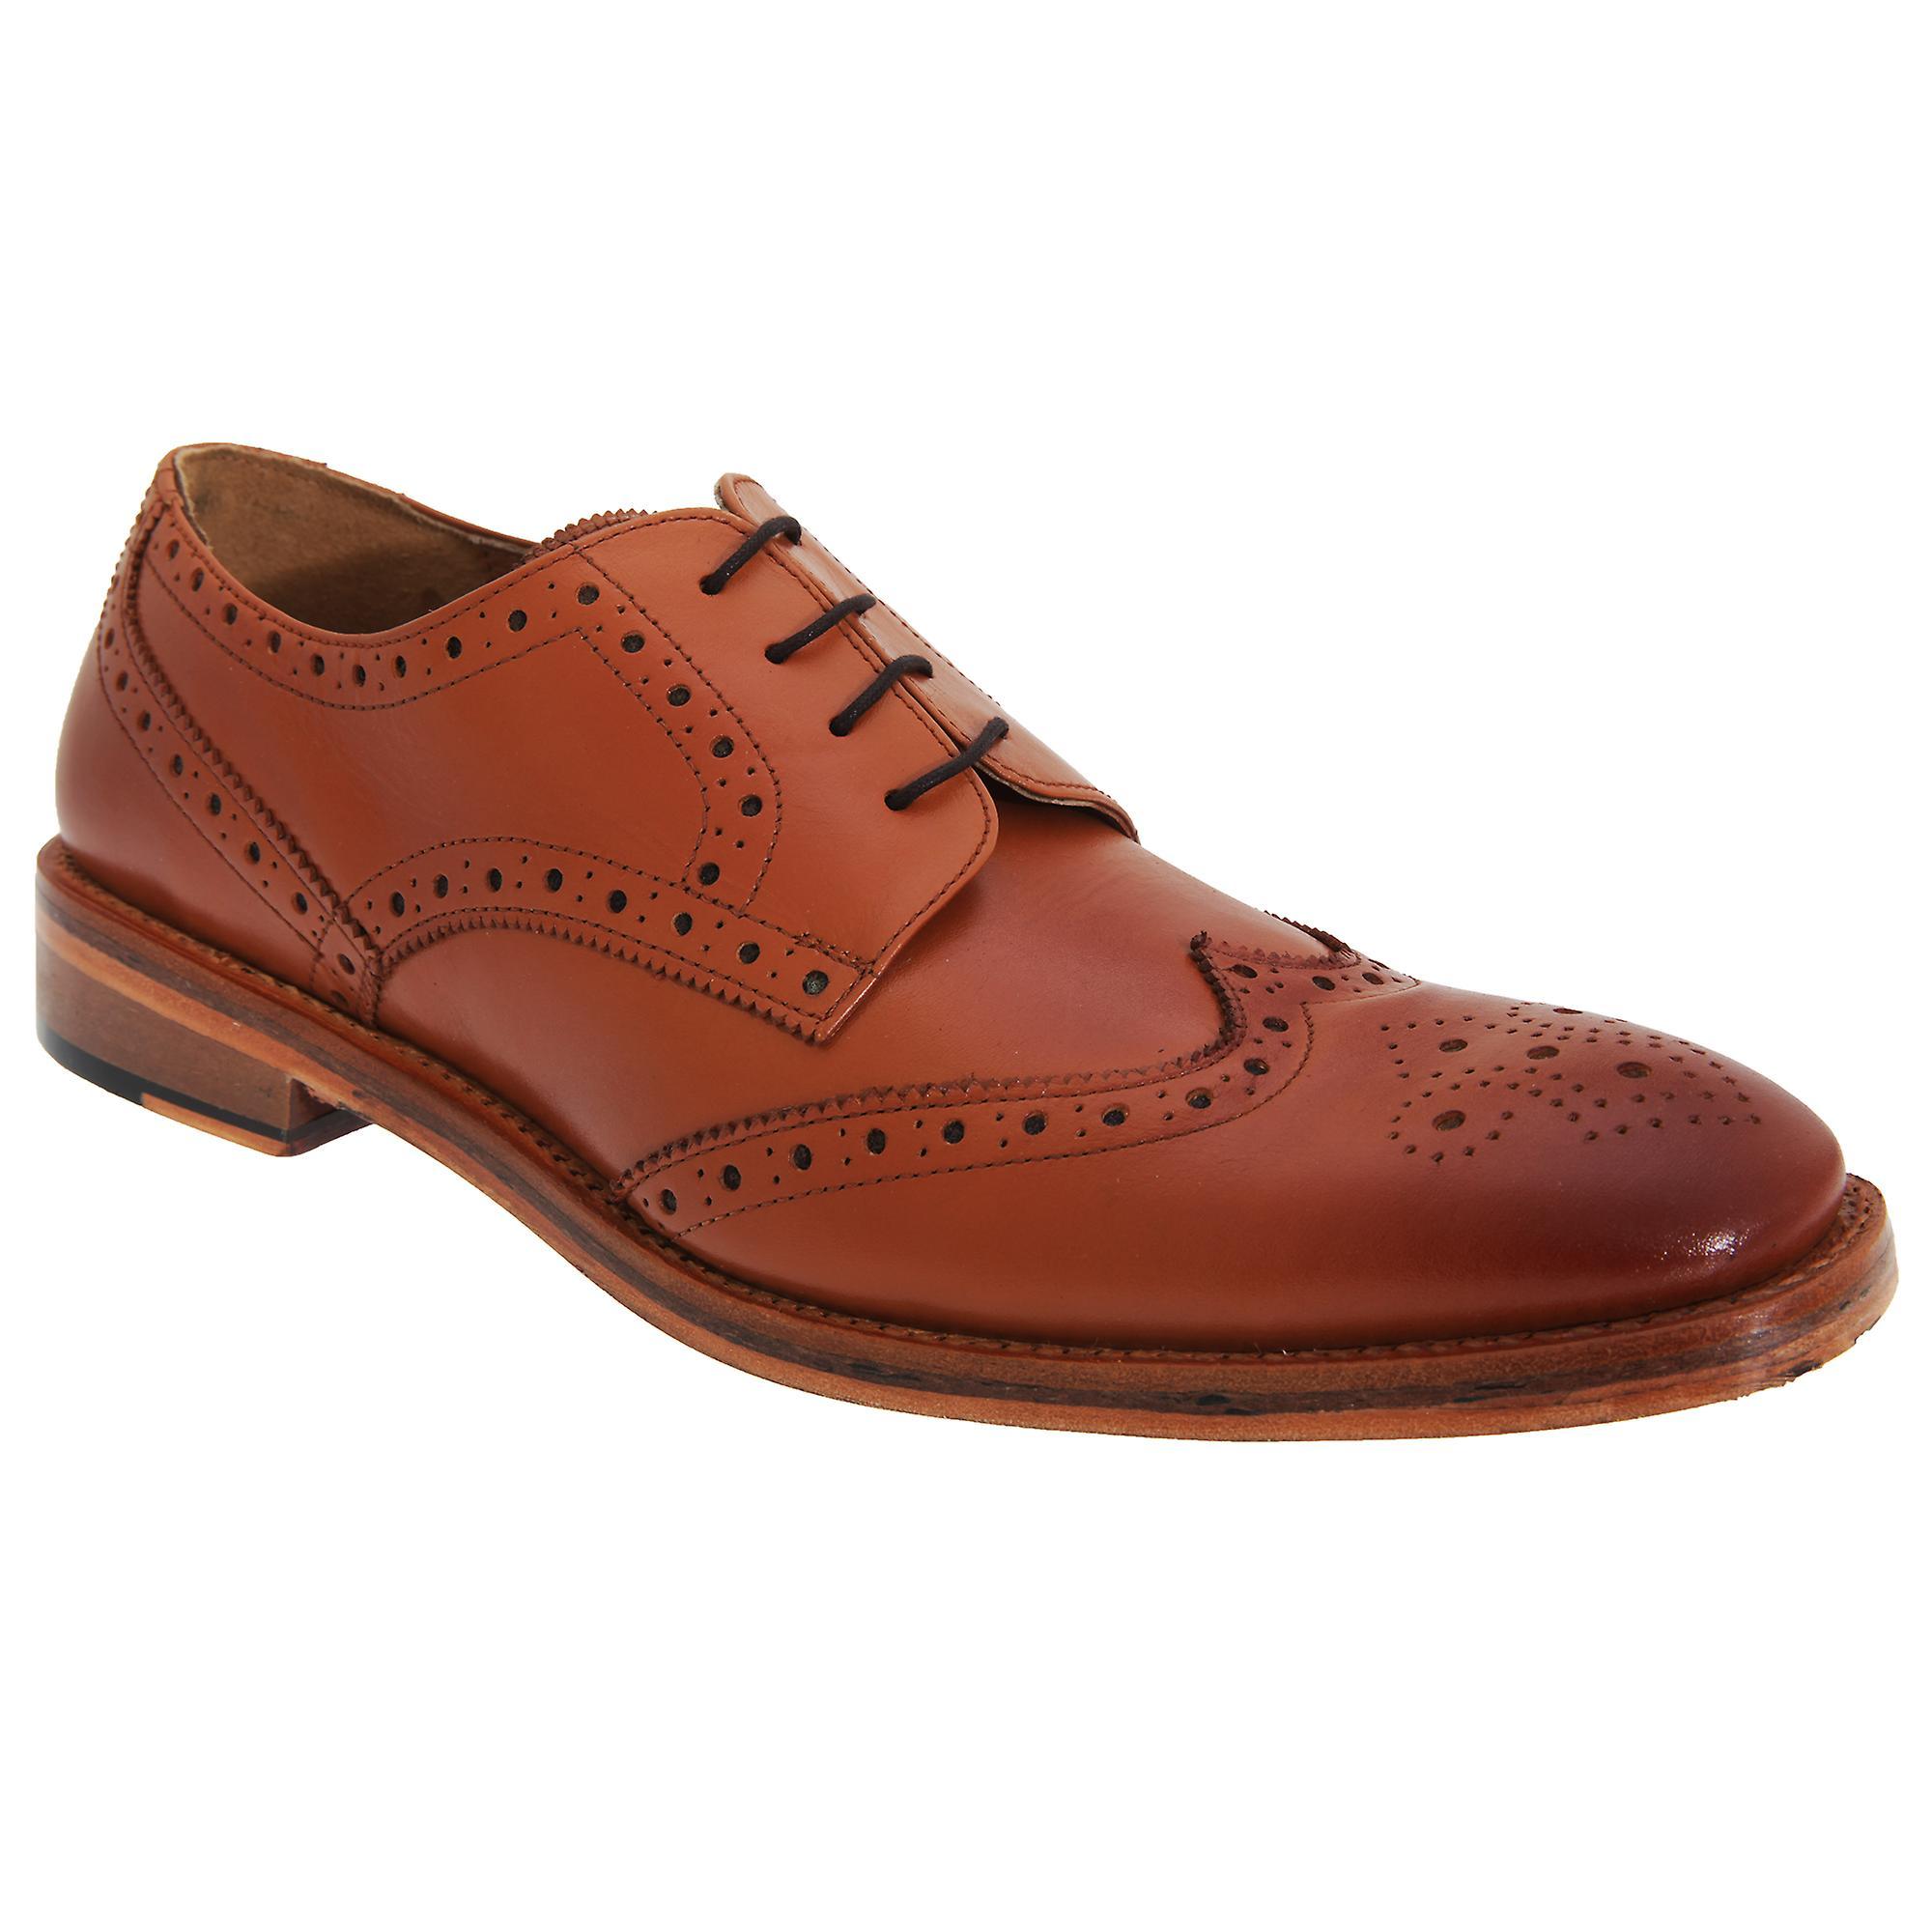 Scarpe Brogue in pelle del Cap di di di ala Gibson di Kensington classici Mens tutti | Qualità e quantità garantite  | Uomini/Donna Scarpa  586d68